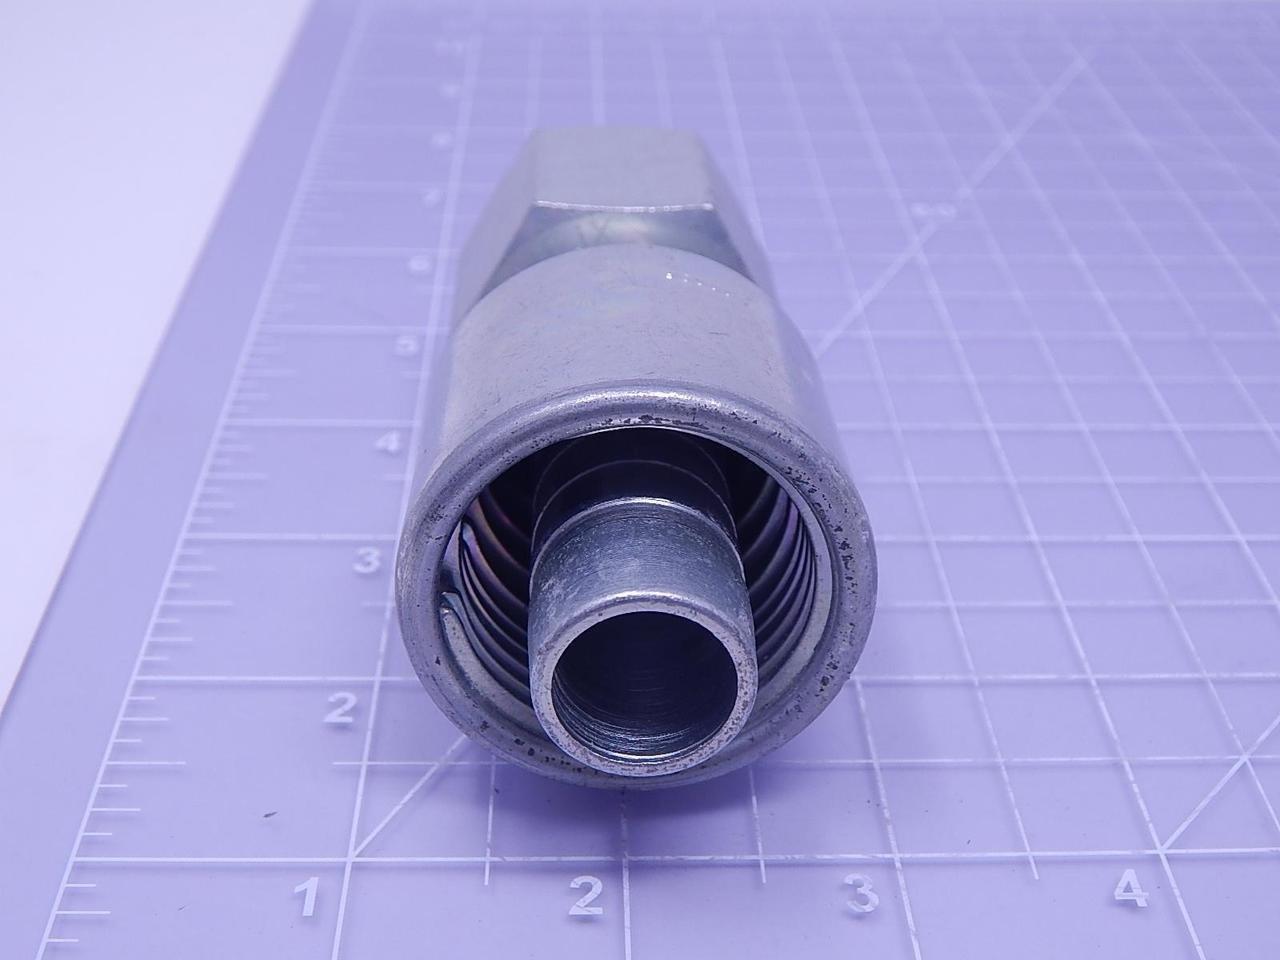 Gates 12G-14FJX MegaCrimp Couplings Zinc Plated Carbon Steel 3.81 Female JIC 37 Flare Swivel 3//4 ID 3.81 3//4 ID G25170-1214-GAT